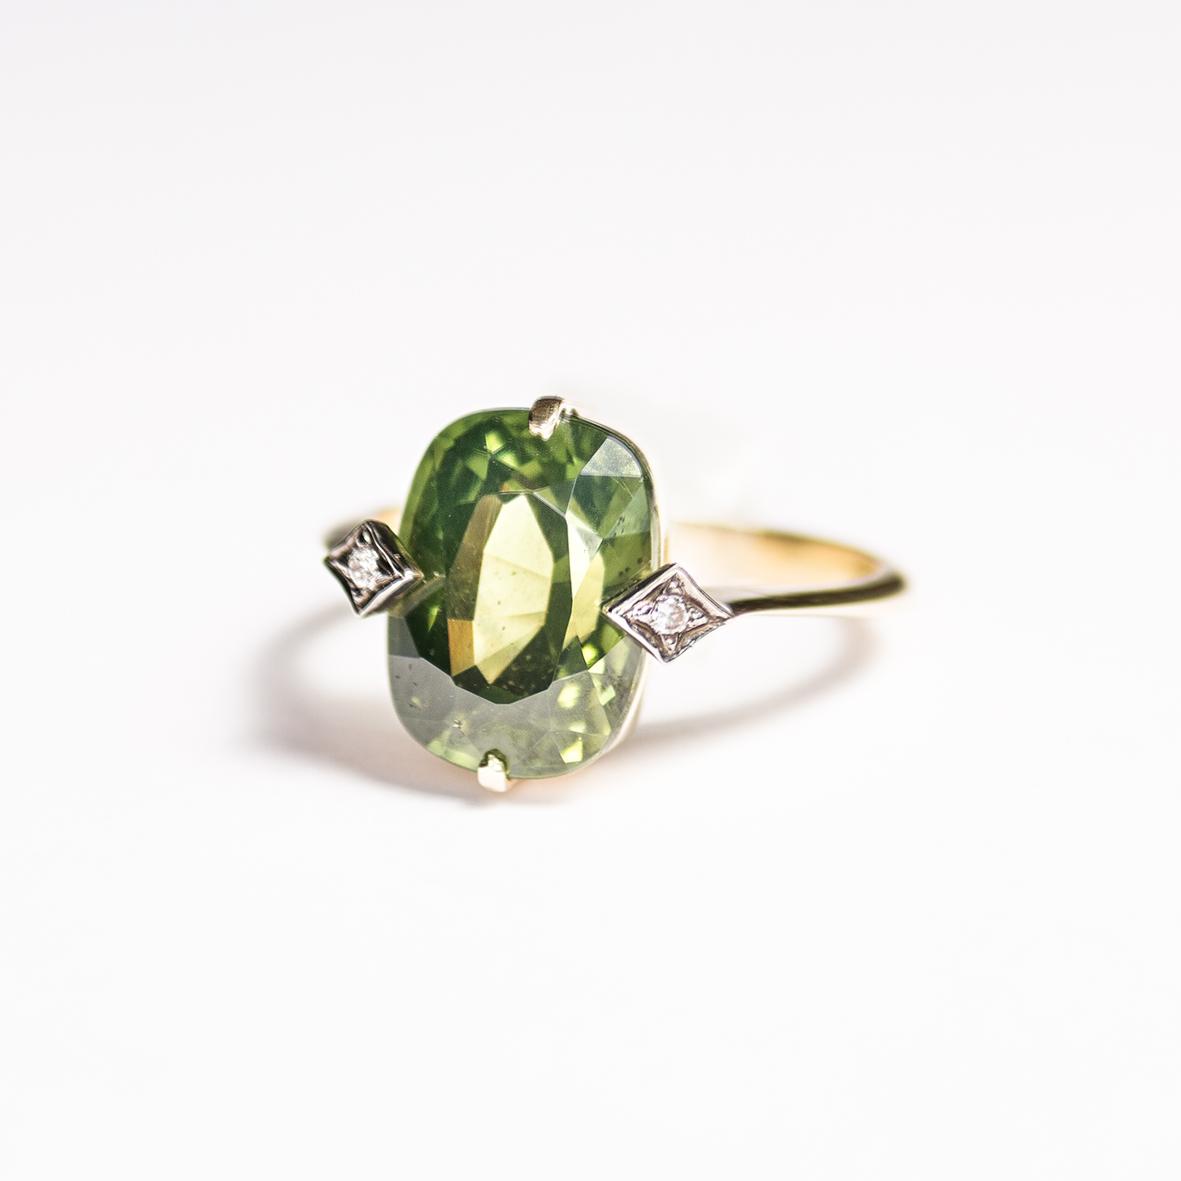 1. OONA_gems of ceylon_ficha2_green tourmaline ring